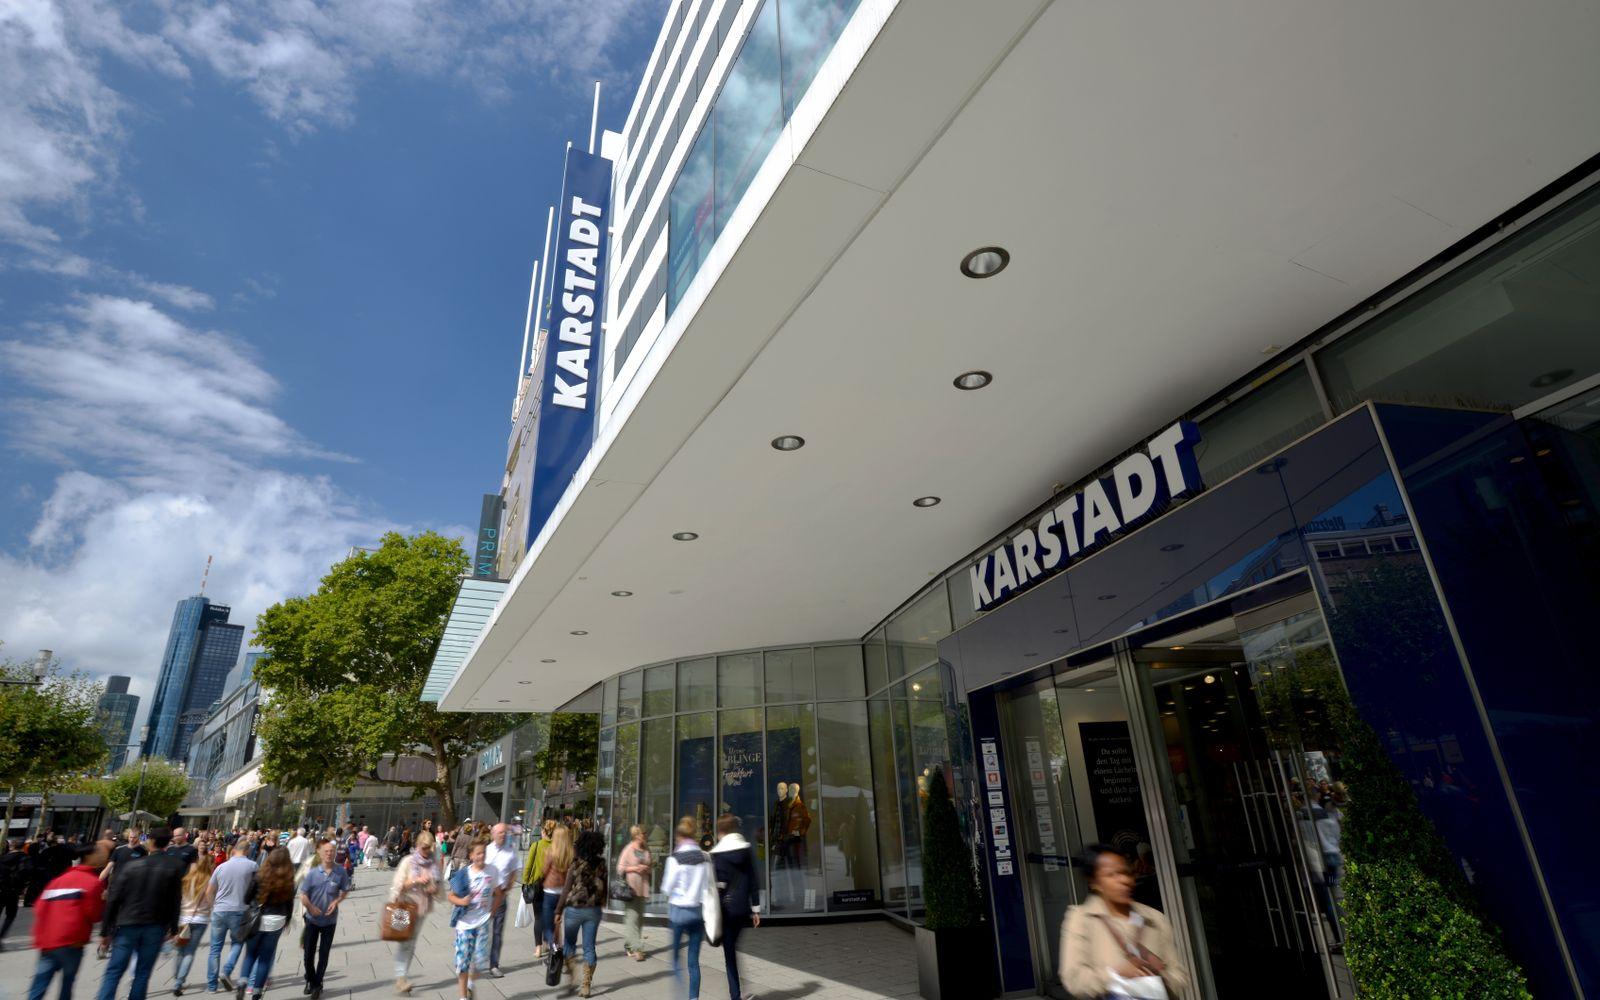 Karstadt Frankfurt Main